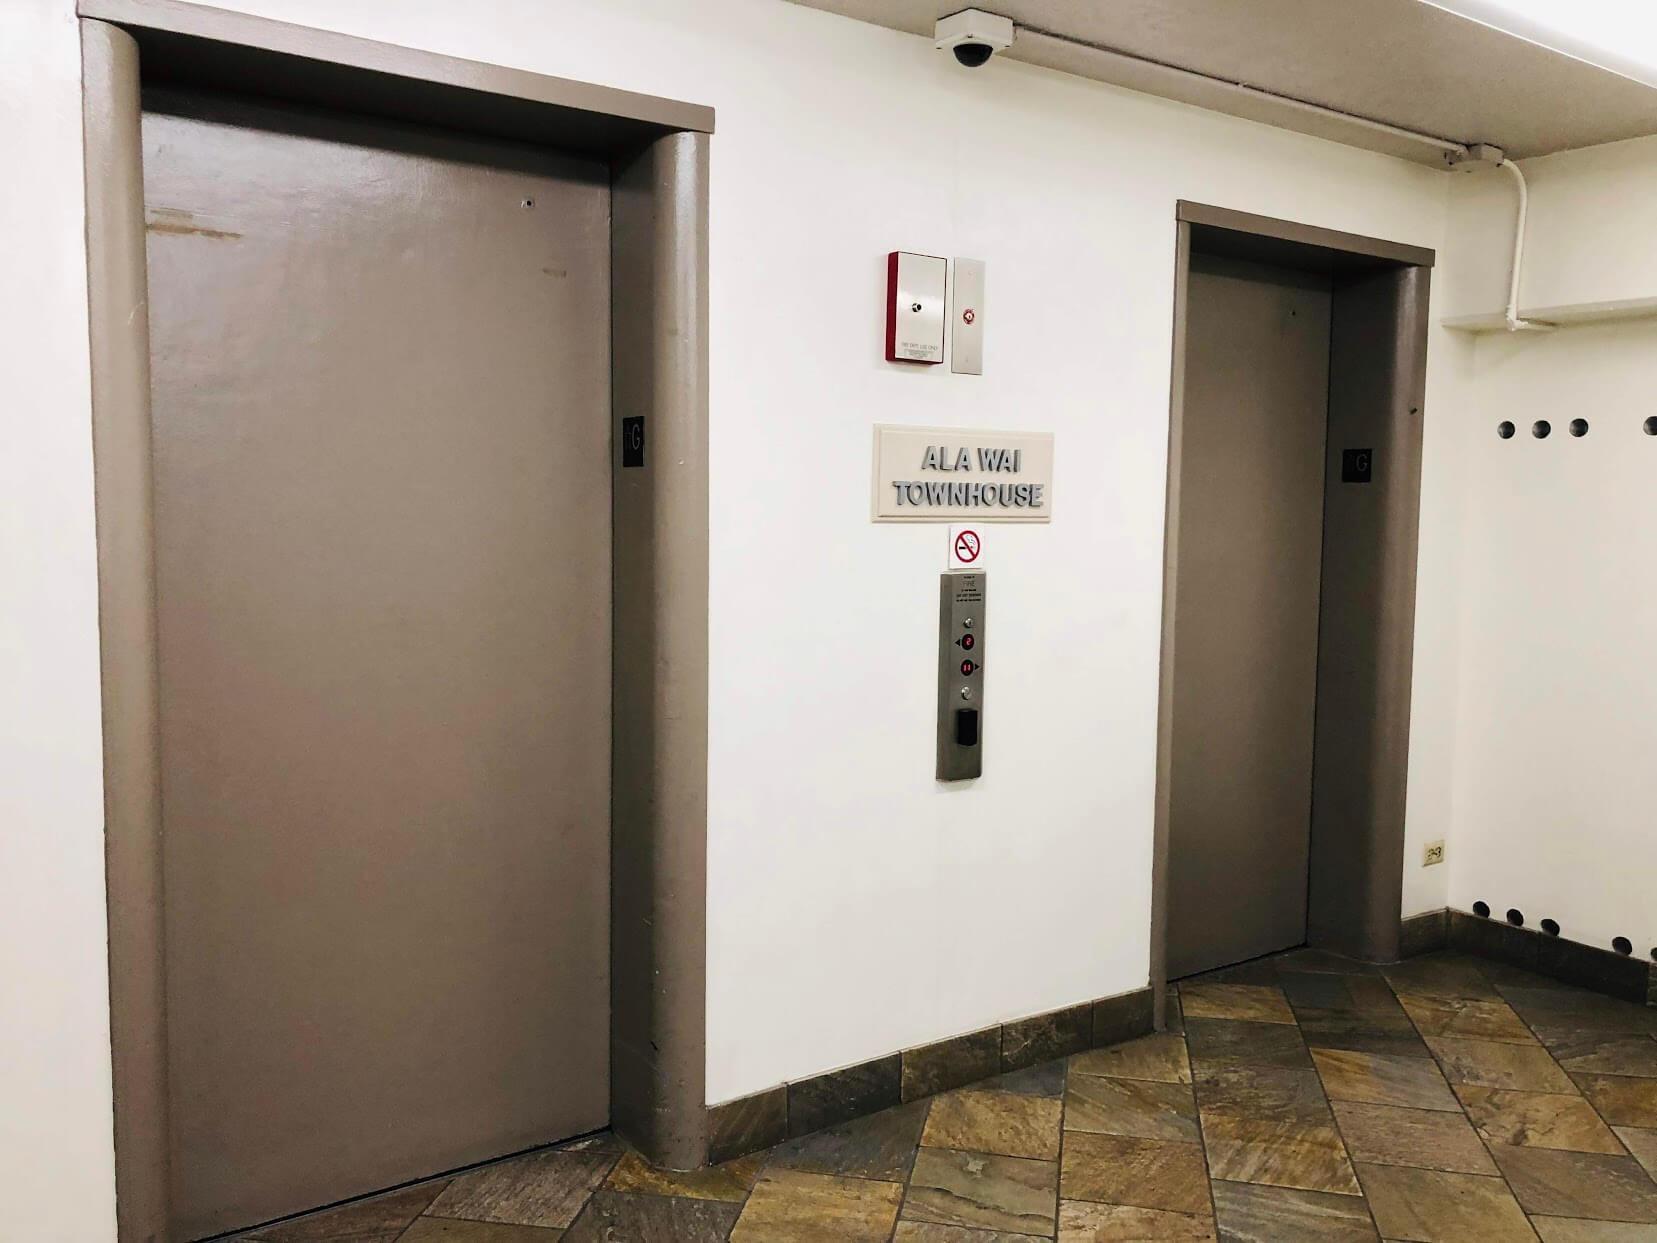 Ala Wai Town Houseのエレベーター